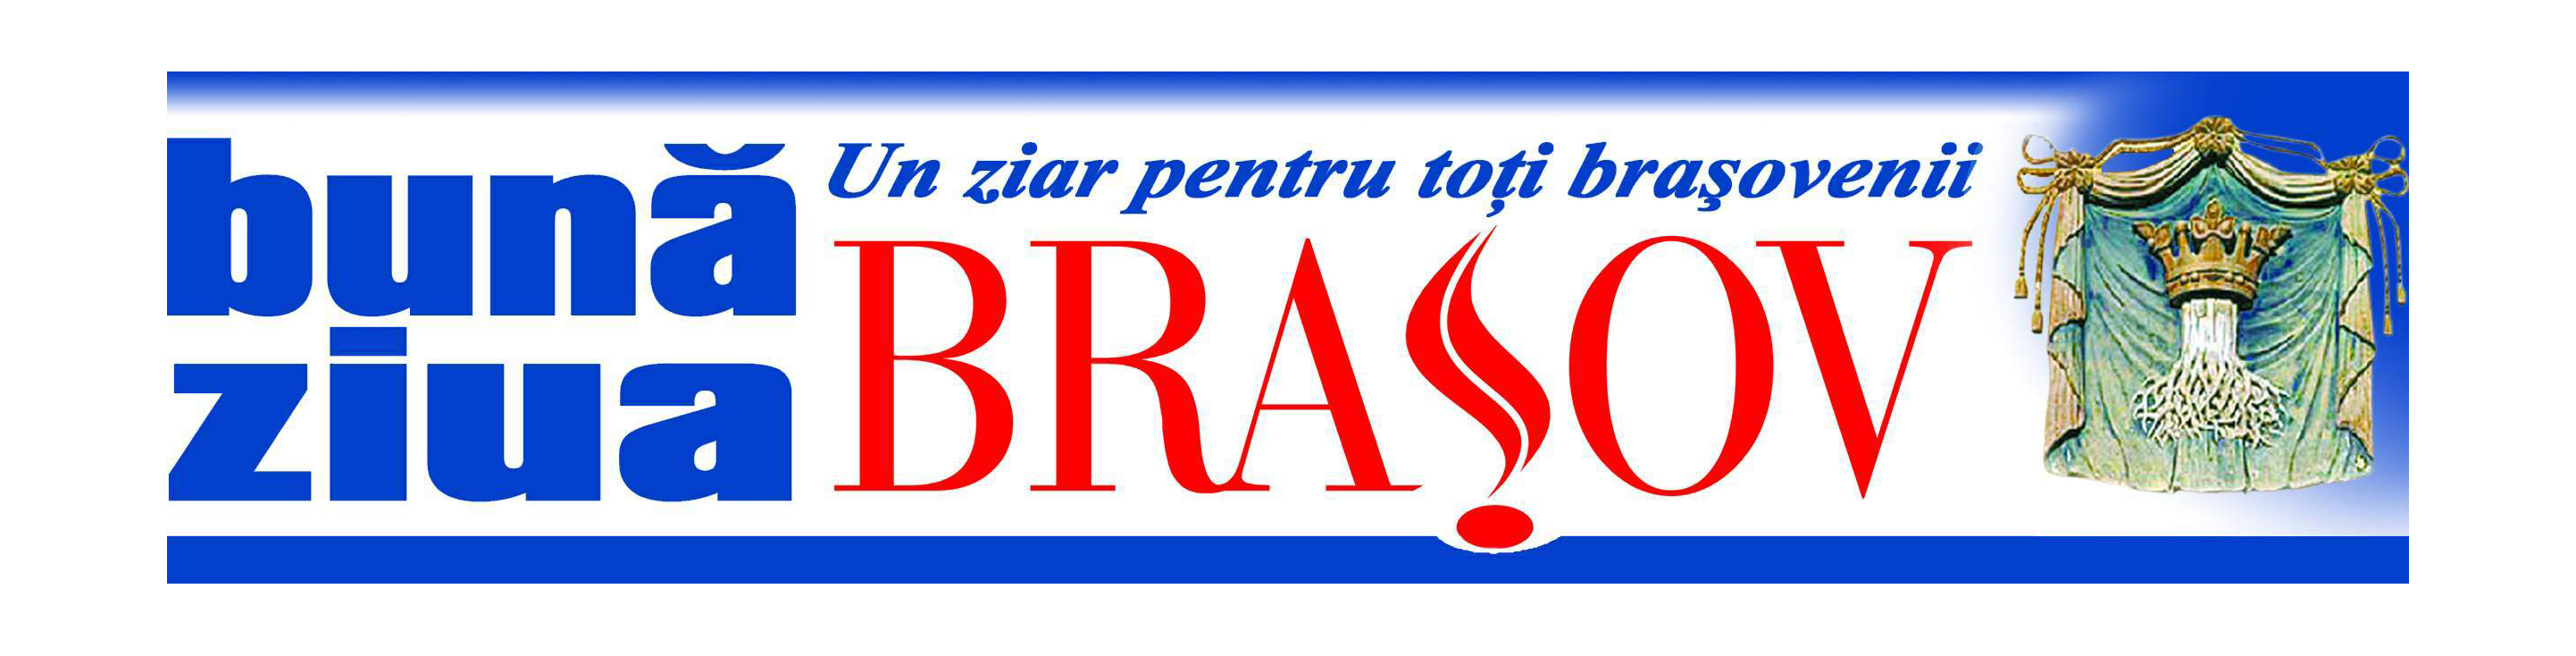 Buna Ziua Brasov